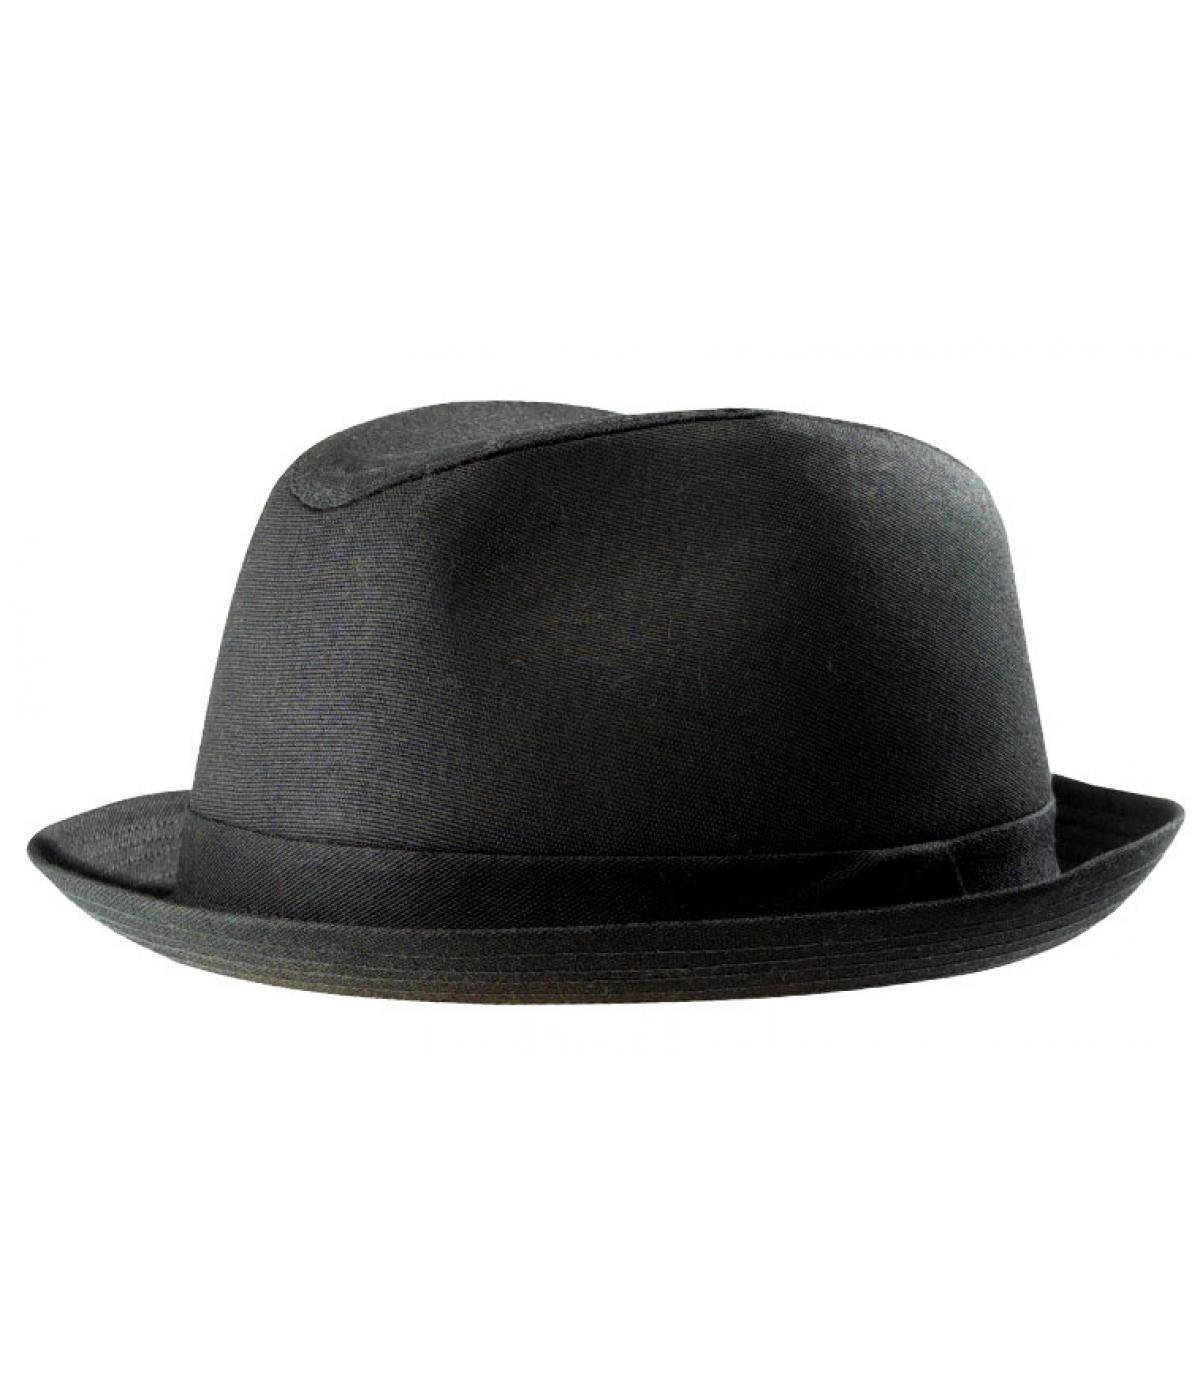 Zwart Stetson trilby